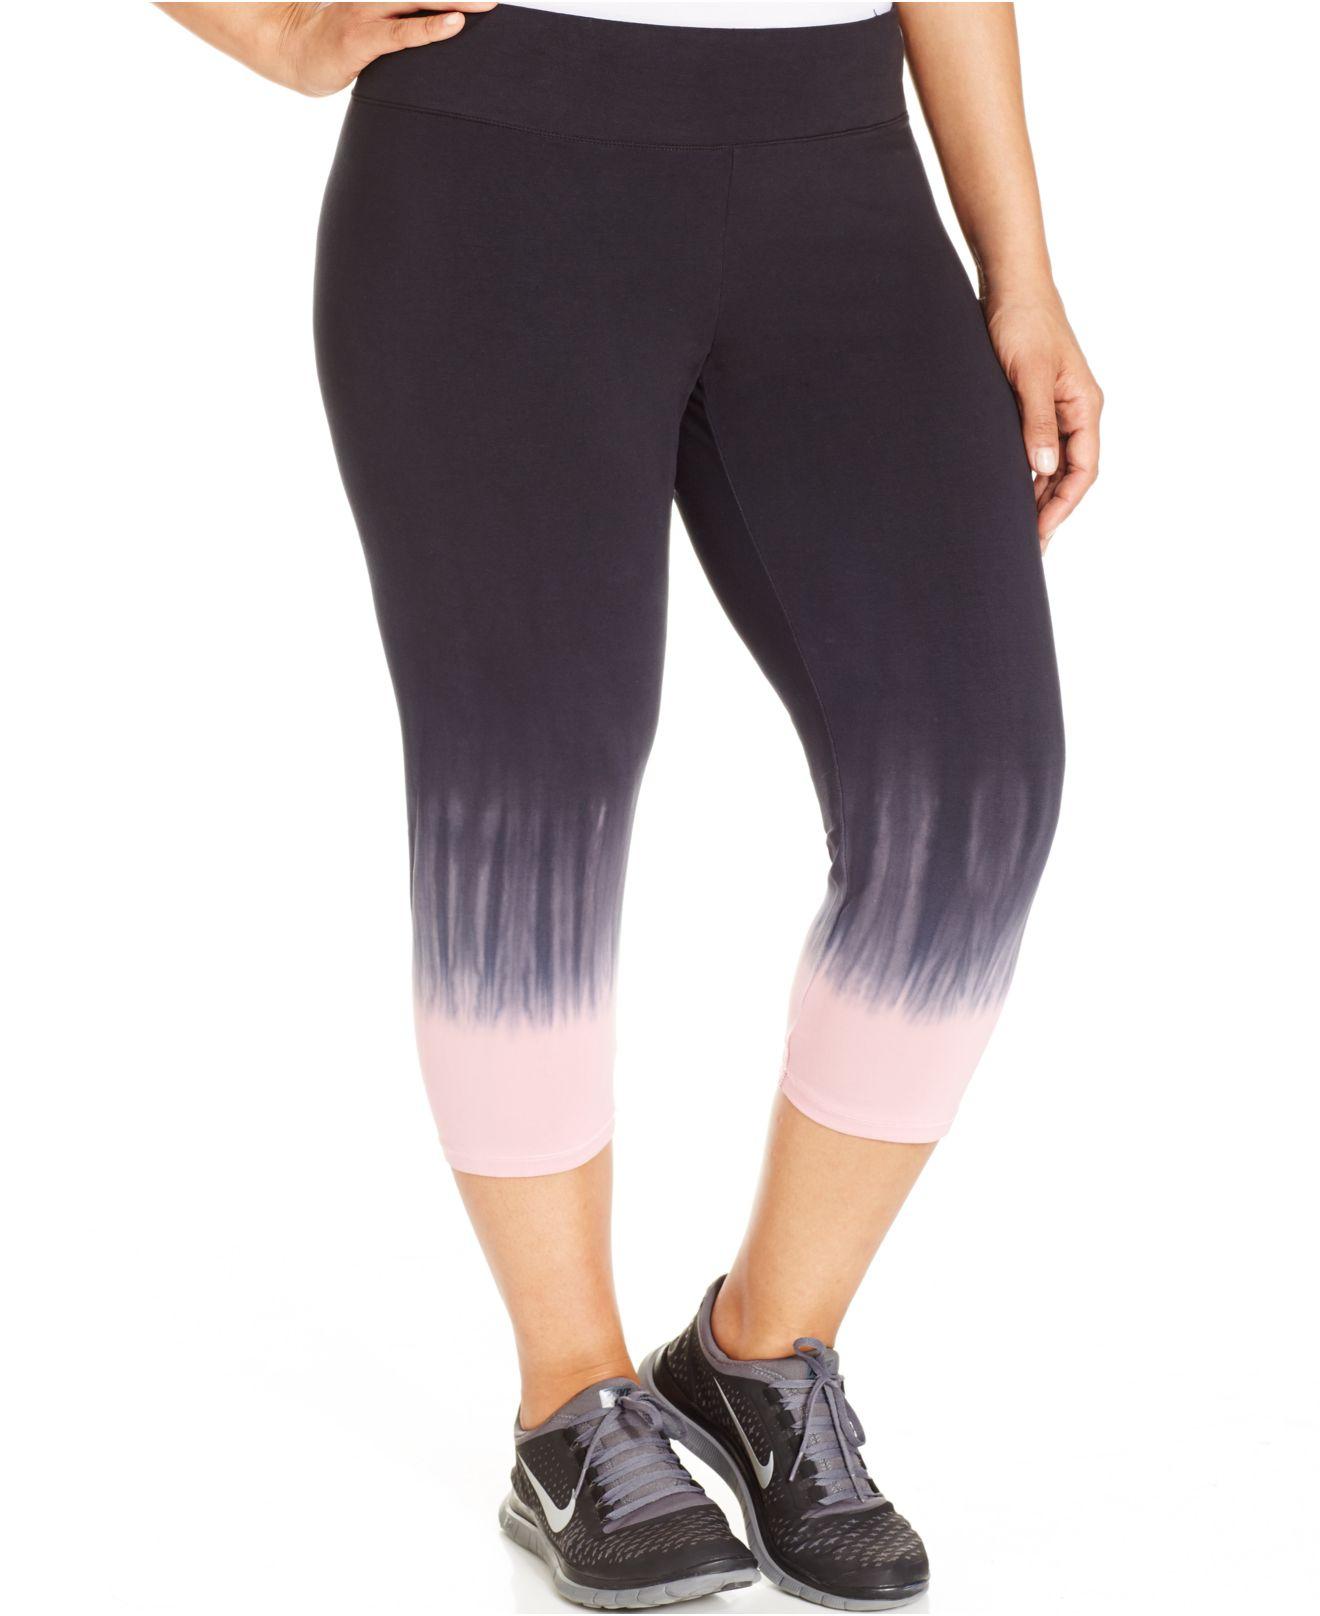 fcecb4f66e5 Lyst - Calvin Klein Performance Plus Size Ombré Capri Leggings in Pink